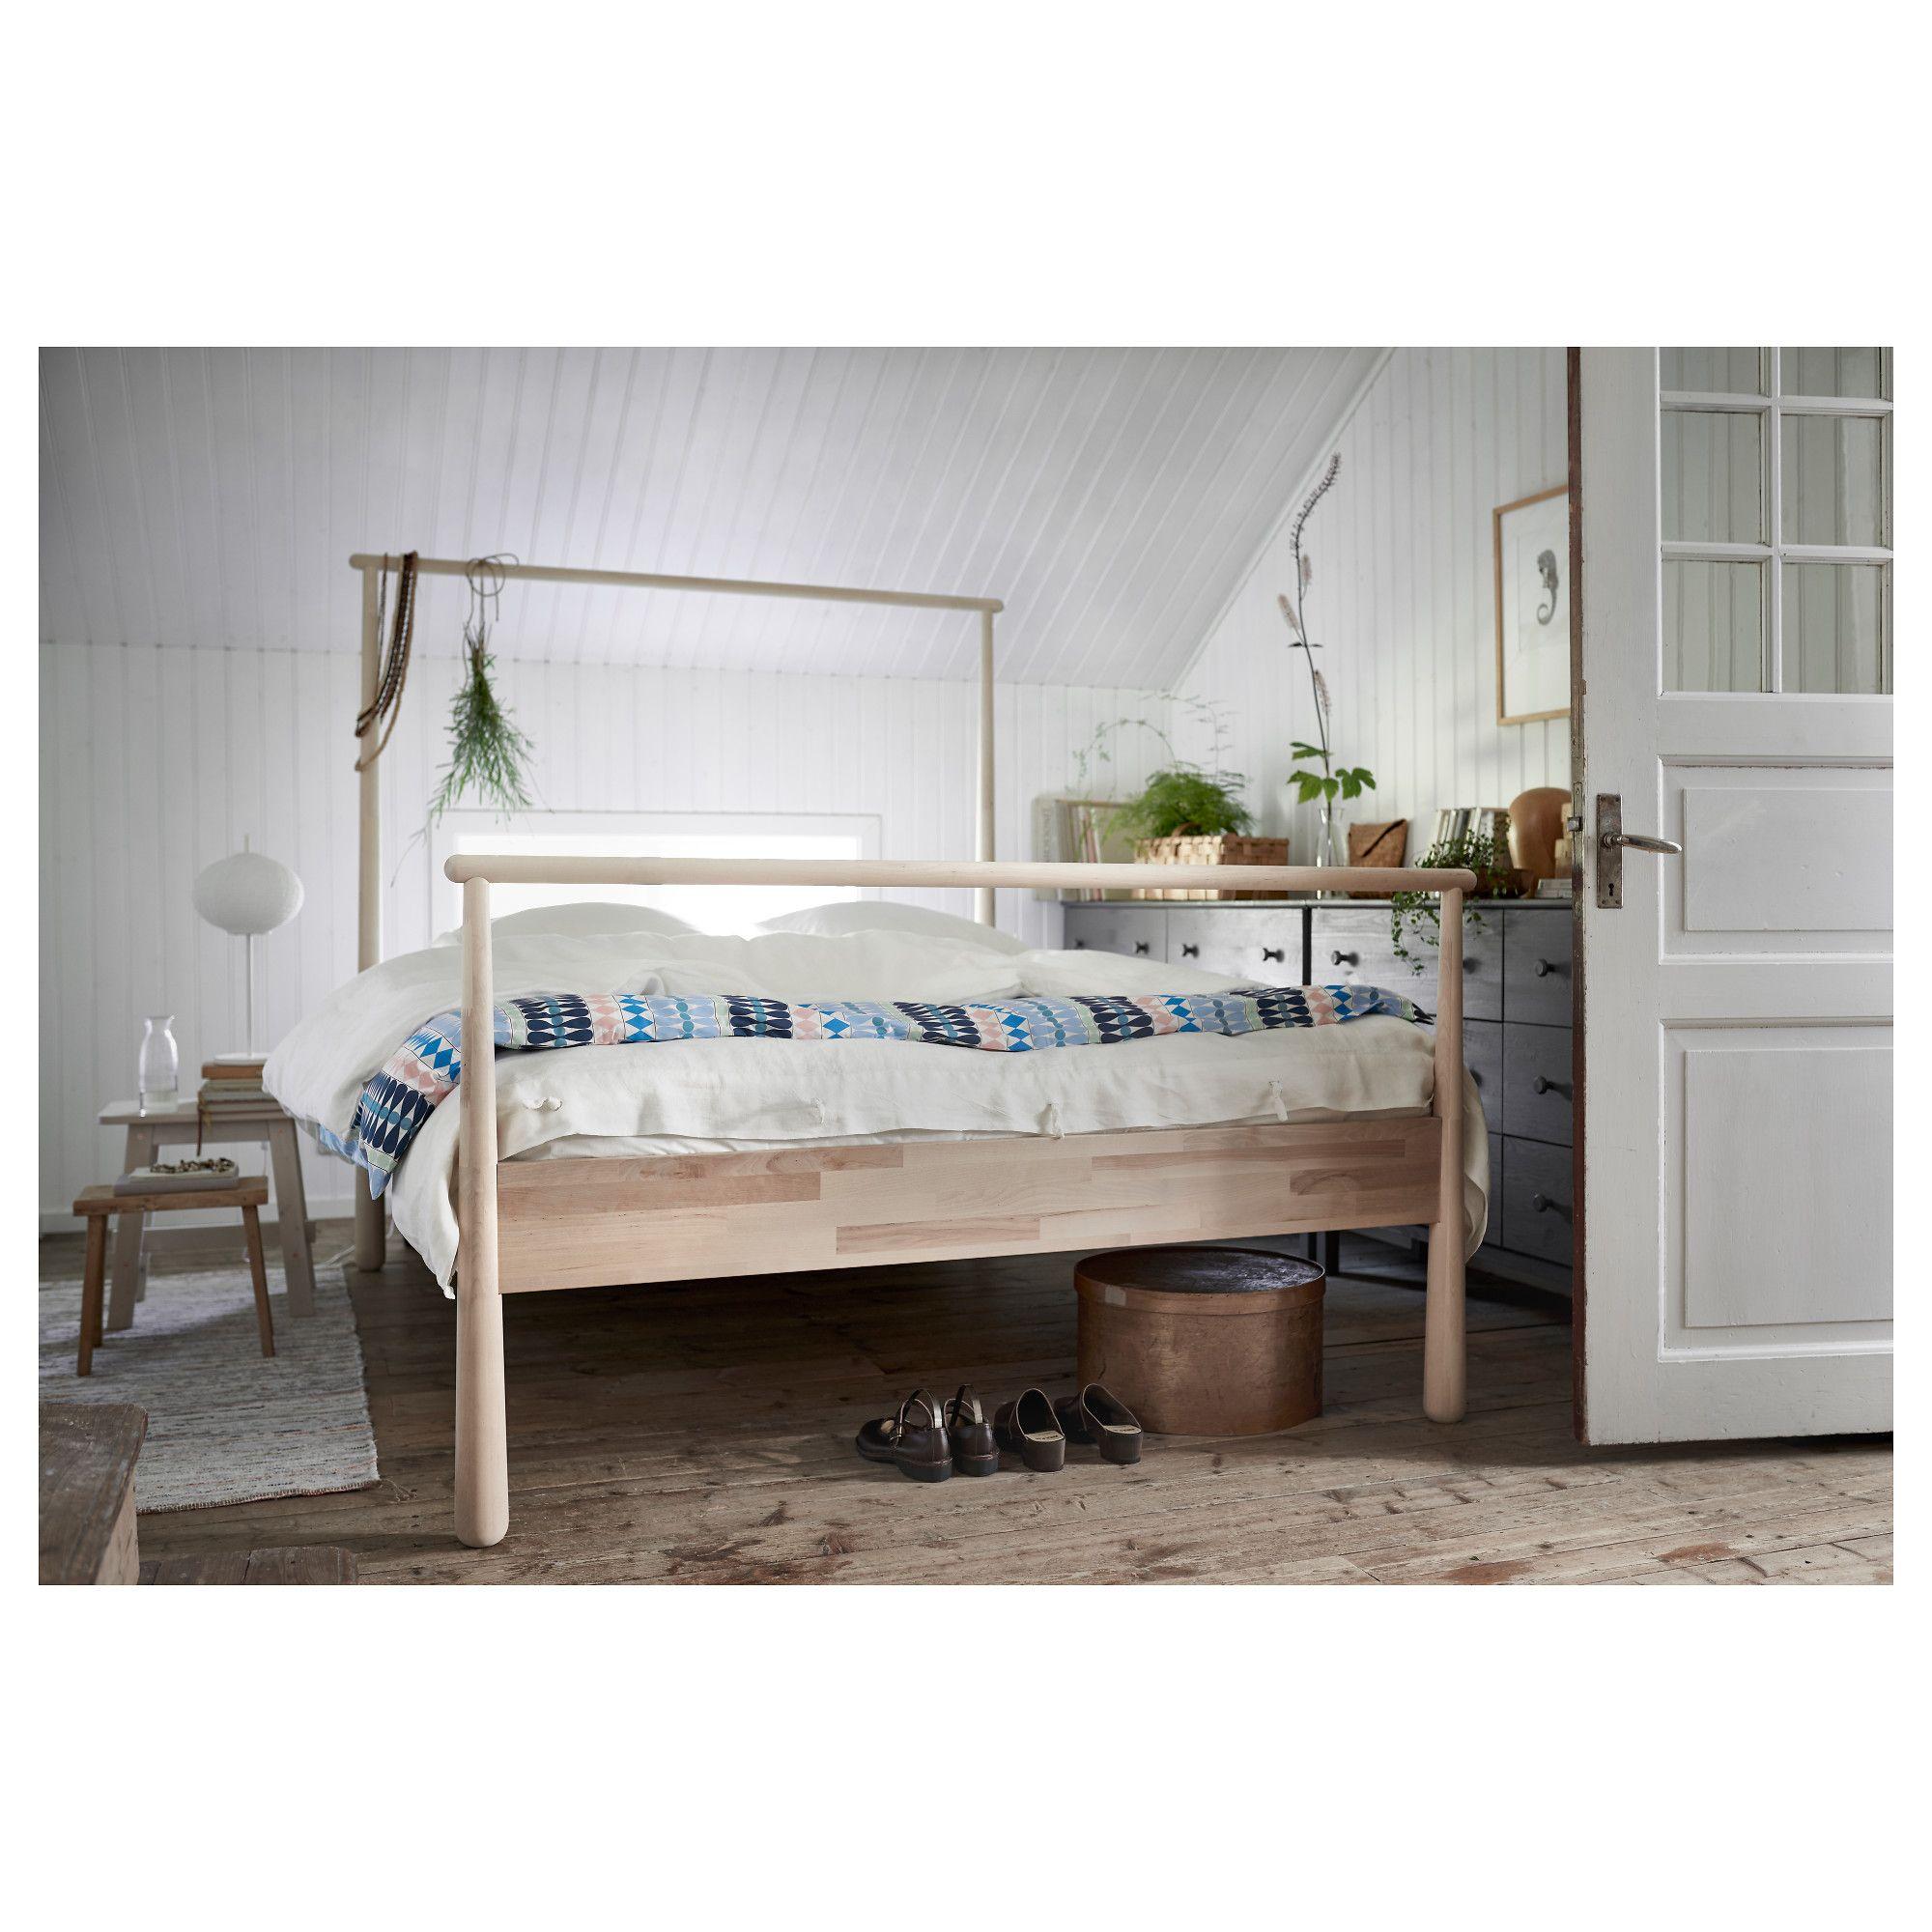 GJÖRA Rama łóżka brzoza 160x200 cm Łóżka, Pomysły ikea